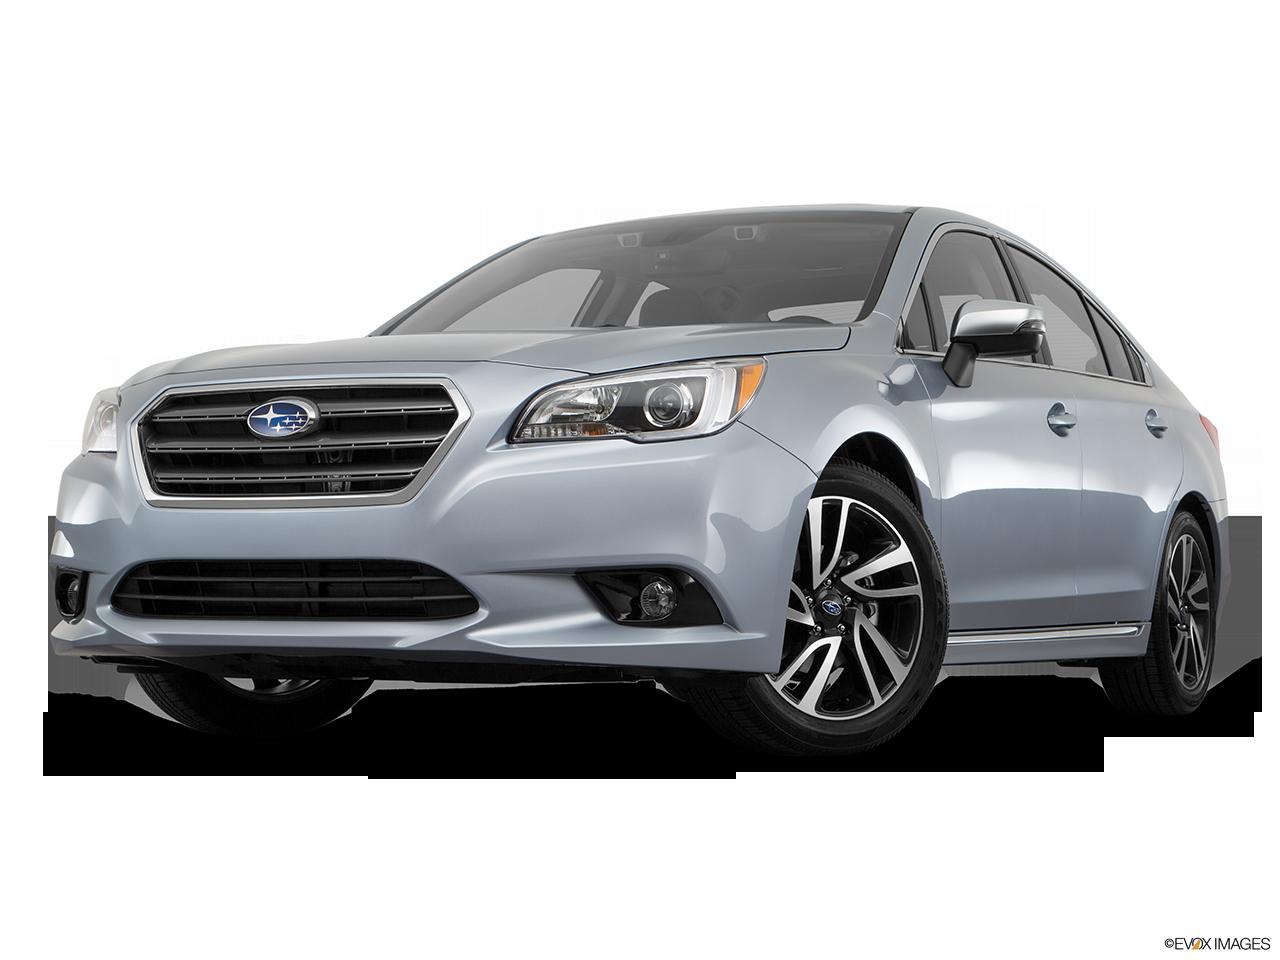 Test Drive A 2017 Subaru Legacy at Galpin Subaru in Los Angeles